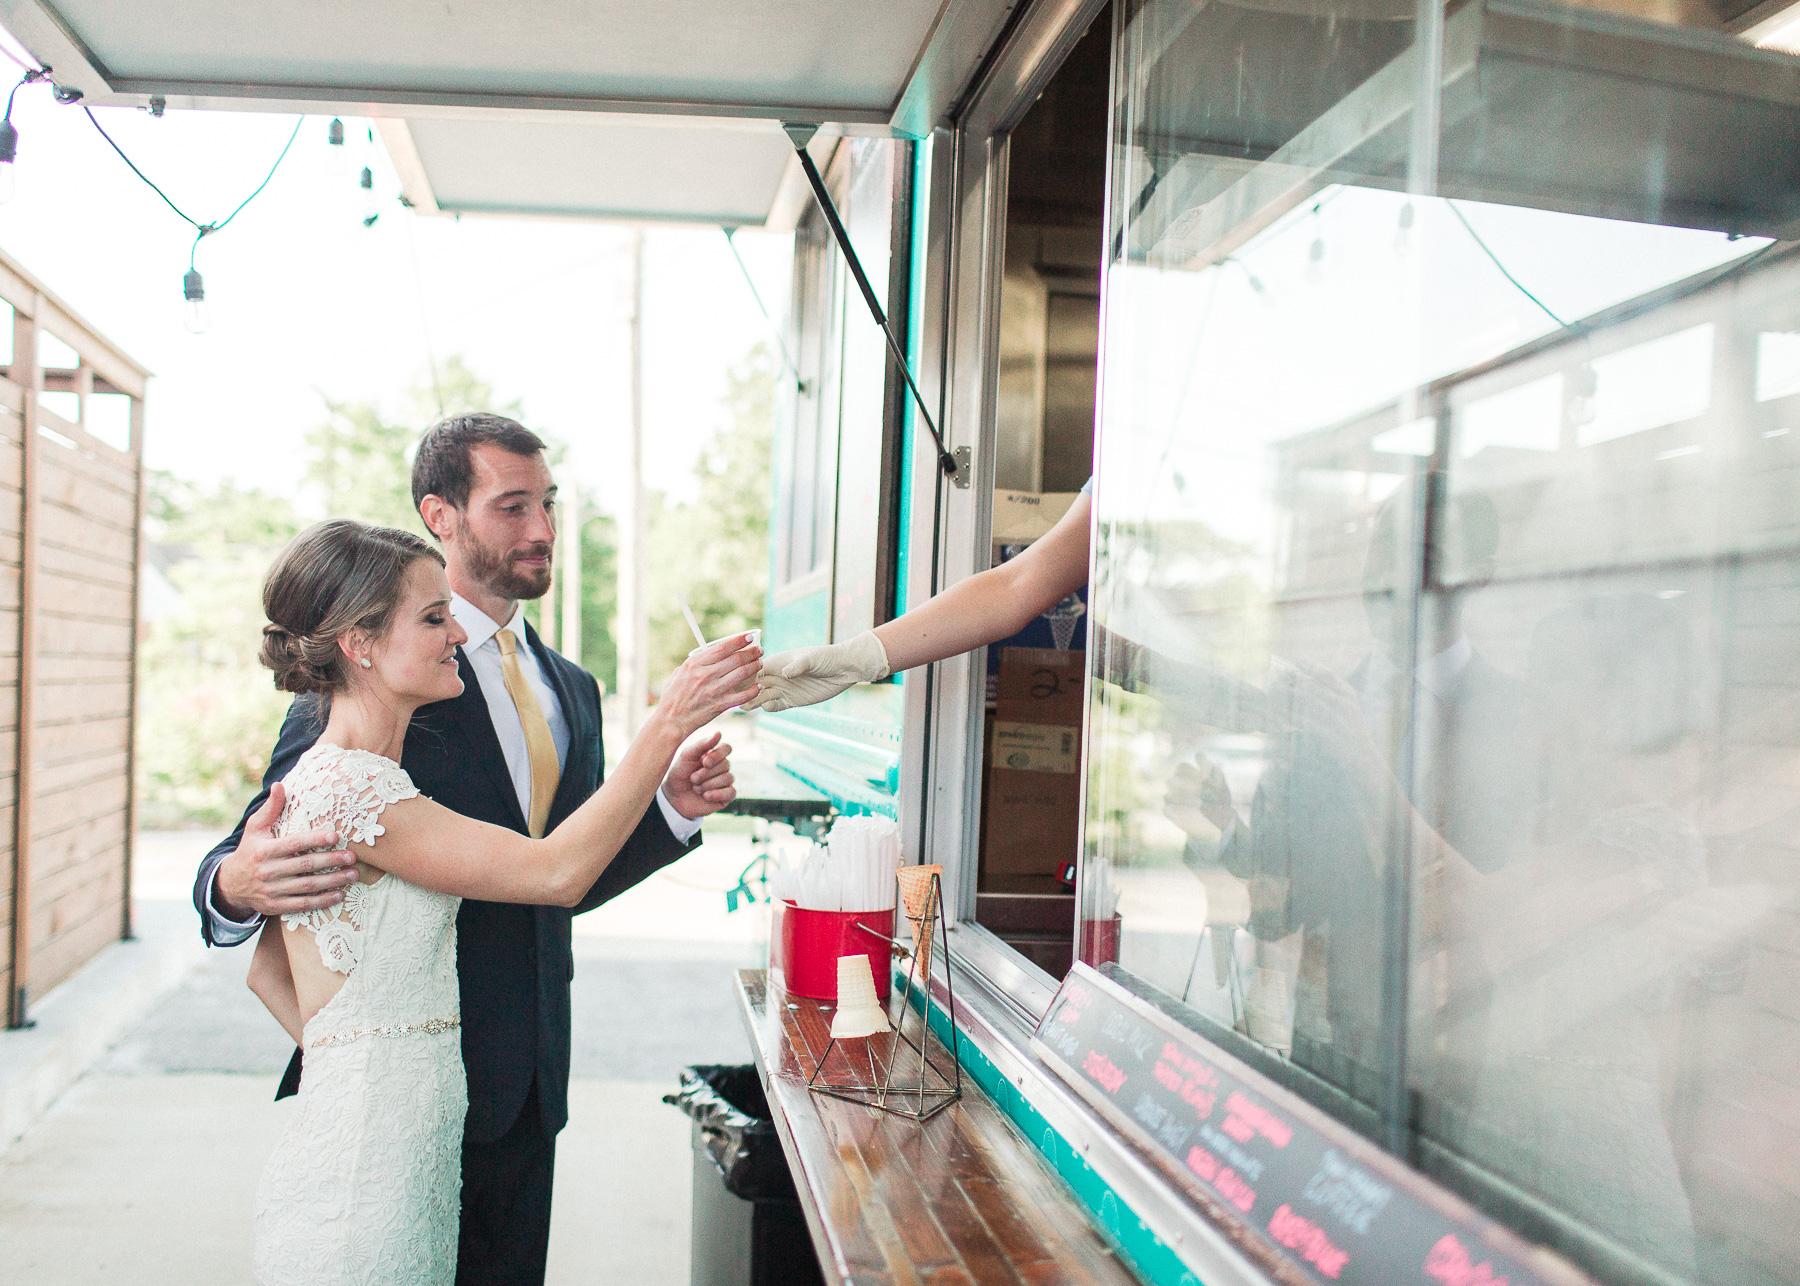 Ordering Ice Cream